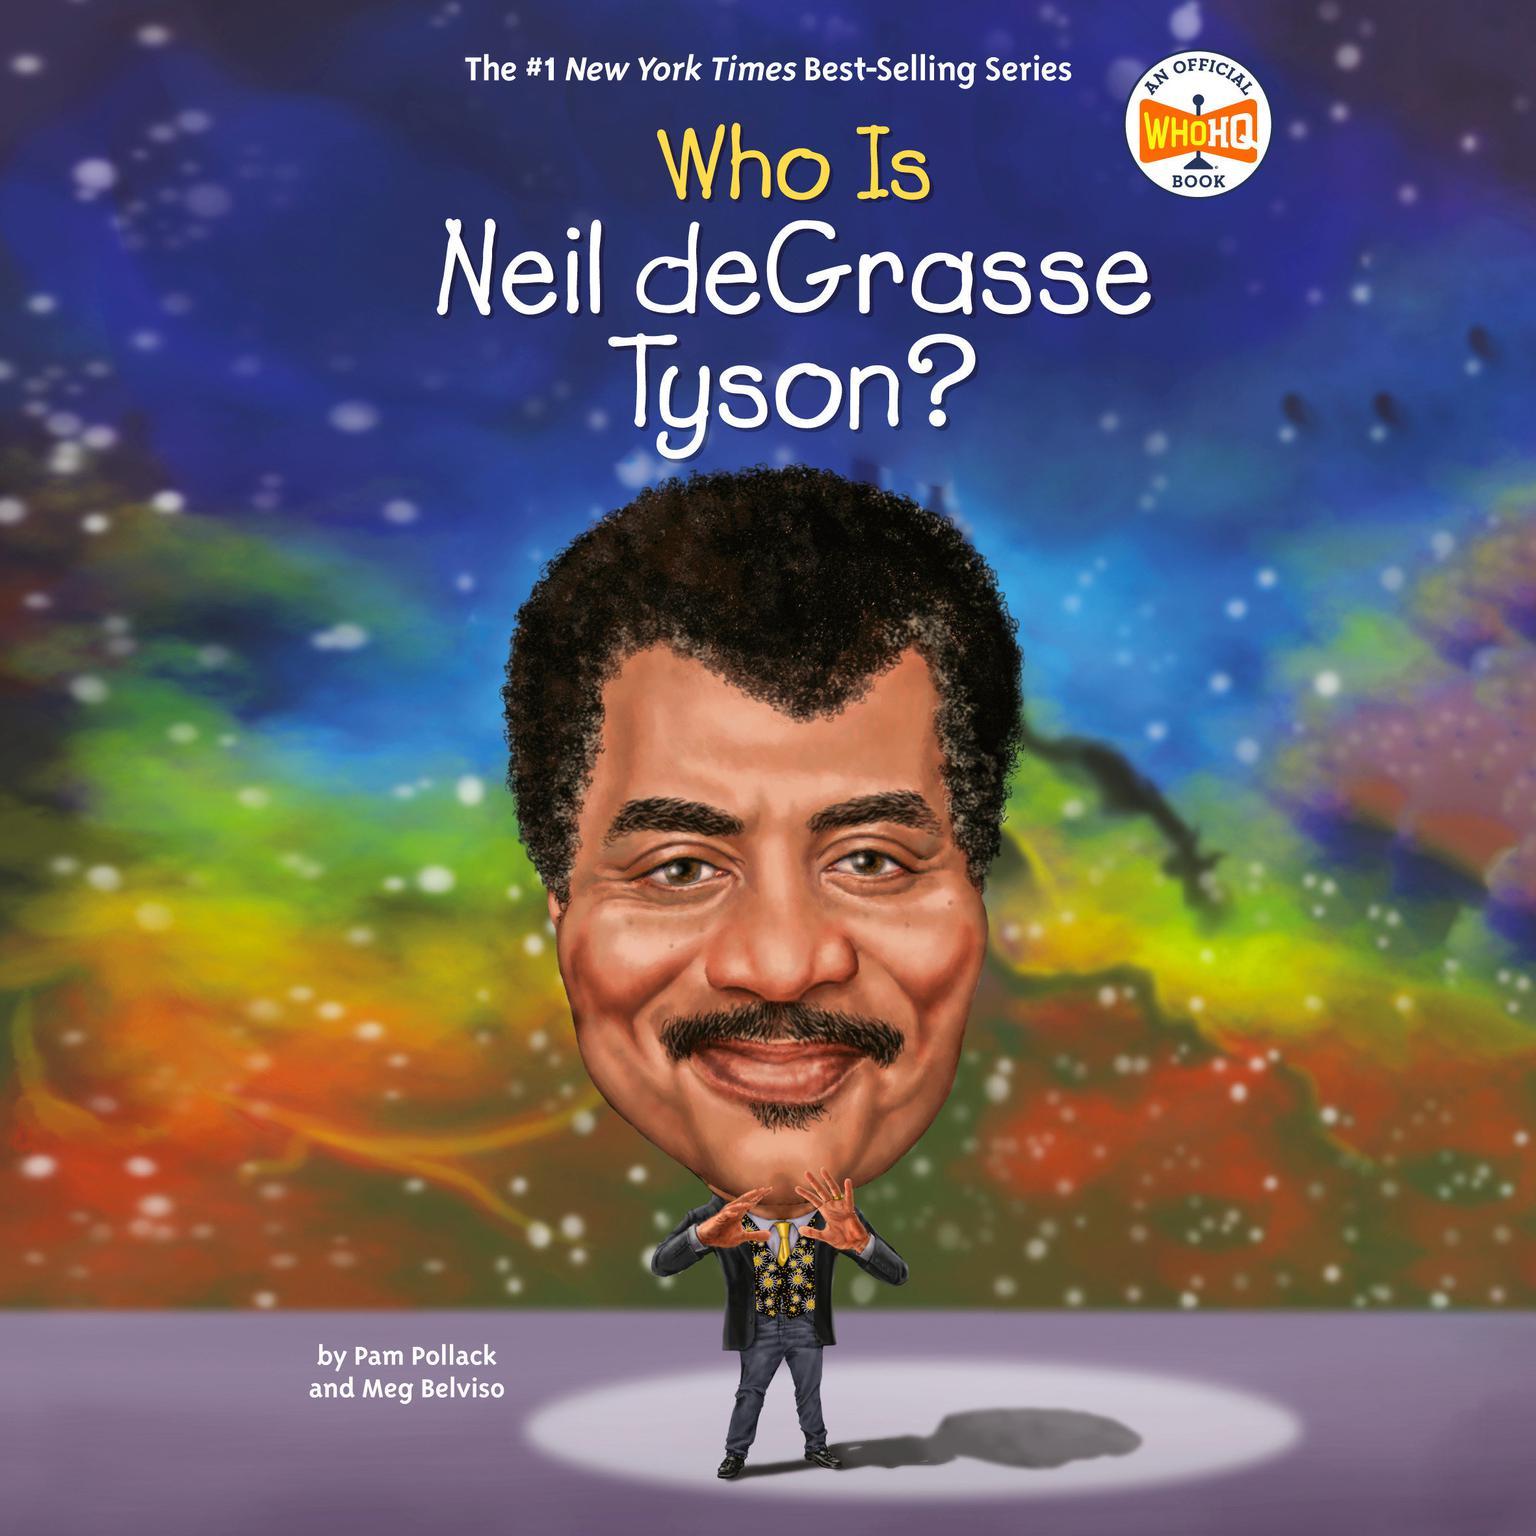 Who Is Neil deGrasse Tyson? Audiobook, by Meg Belviso